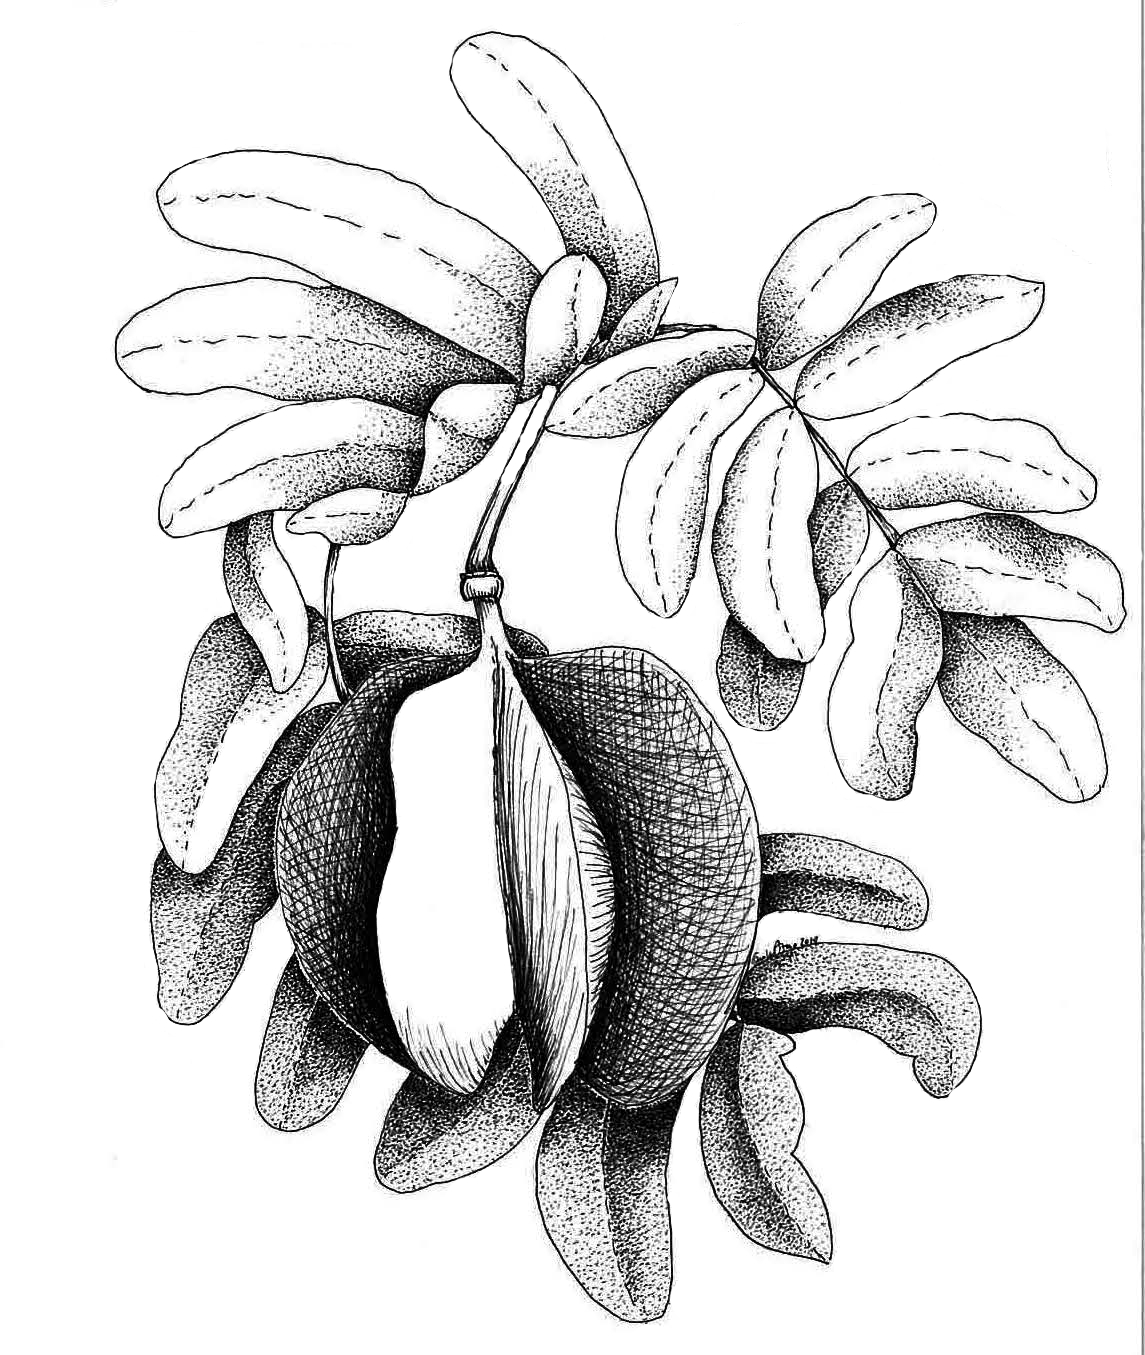 Bulsera arborea